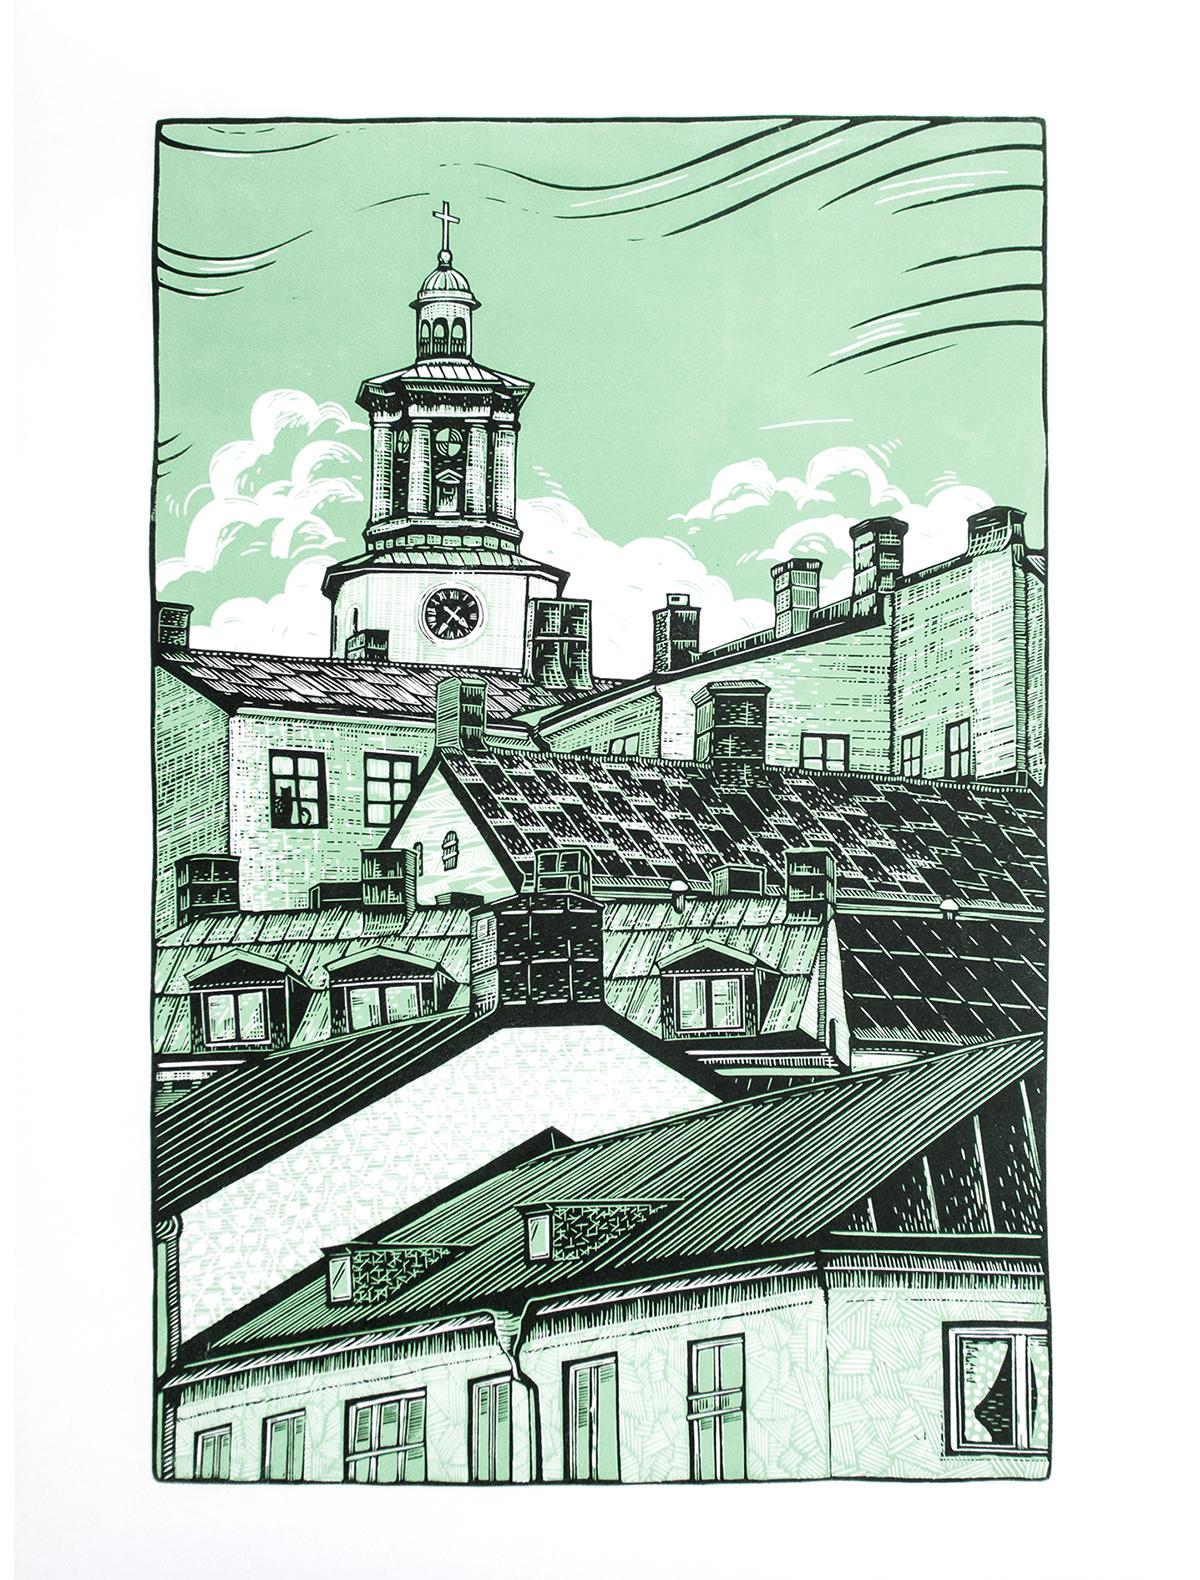 st-maria-magdalena-kyrka-linocut-green-1200.jpg